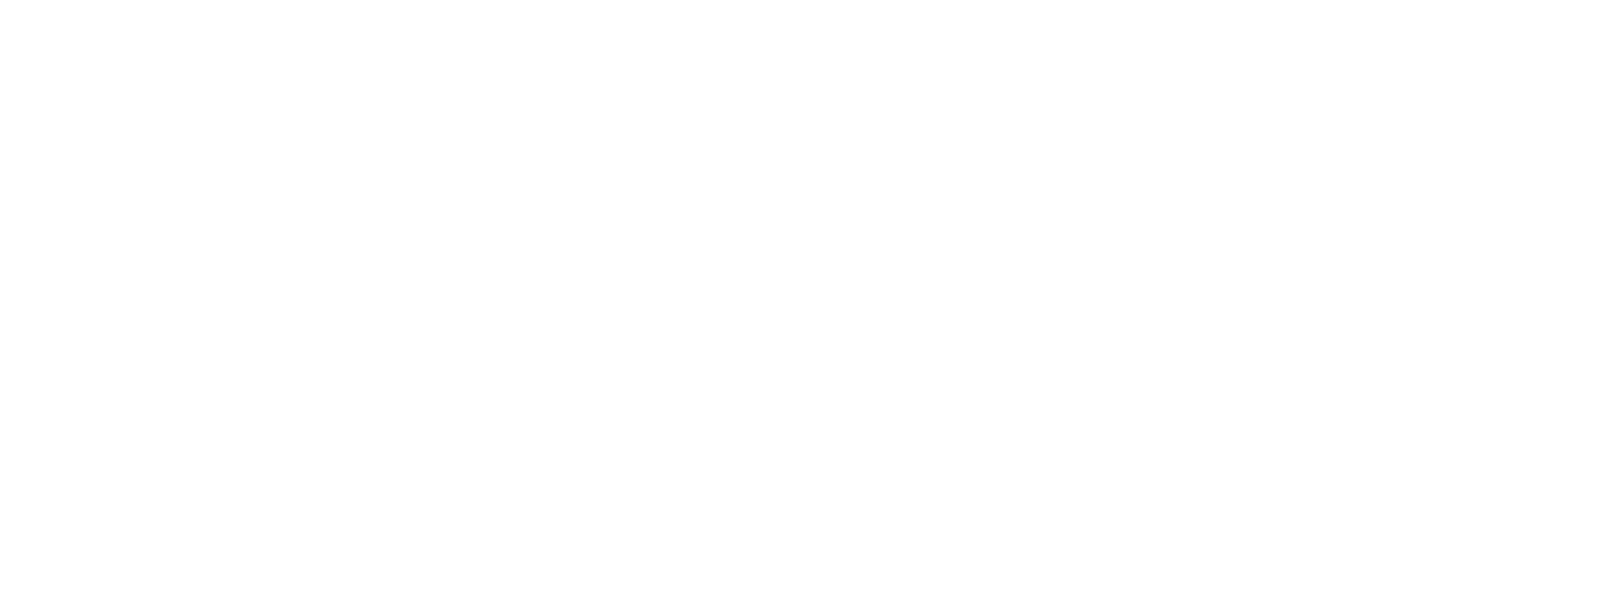 Scan-R